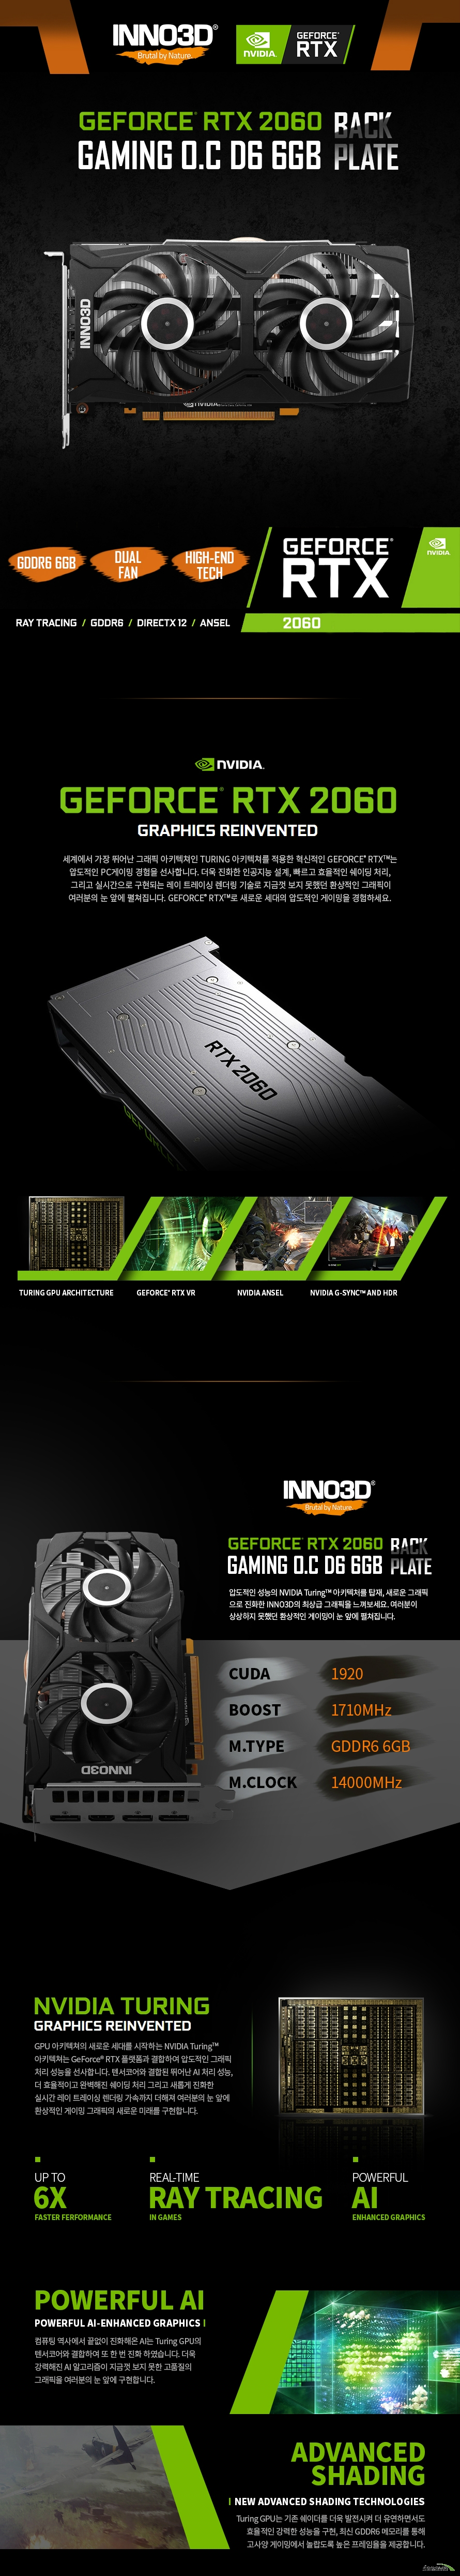 INNO3D 지포스 RTX 2060 GAMING O.C D6 6GB 백플레이트  gpu사양 쿠다 코어 1920 베이스 클럭 1365메가헤르츠 부스트 클럭 1710메가헤르츠  메모리 사양 메모리 속도 14000메가헤르츠 메모리타입 6gb gddr6 인터페이스 192비트  전력 사양 소모 전력 160와트 권장 시스템 전력 500와트 파워 커넥터 타입 8핀 전원 커넥터  디스플레이 후면 디스플레이 포트  Hdmi 2.0b 포트 1개 디스플레이 포트 1.4 포트 3개  KC인증번호 R-R-IVM-TU60161  다중 모니터 지원 최대 4대 모니터 지원